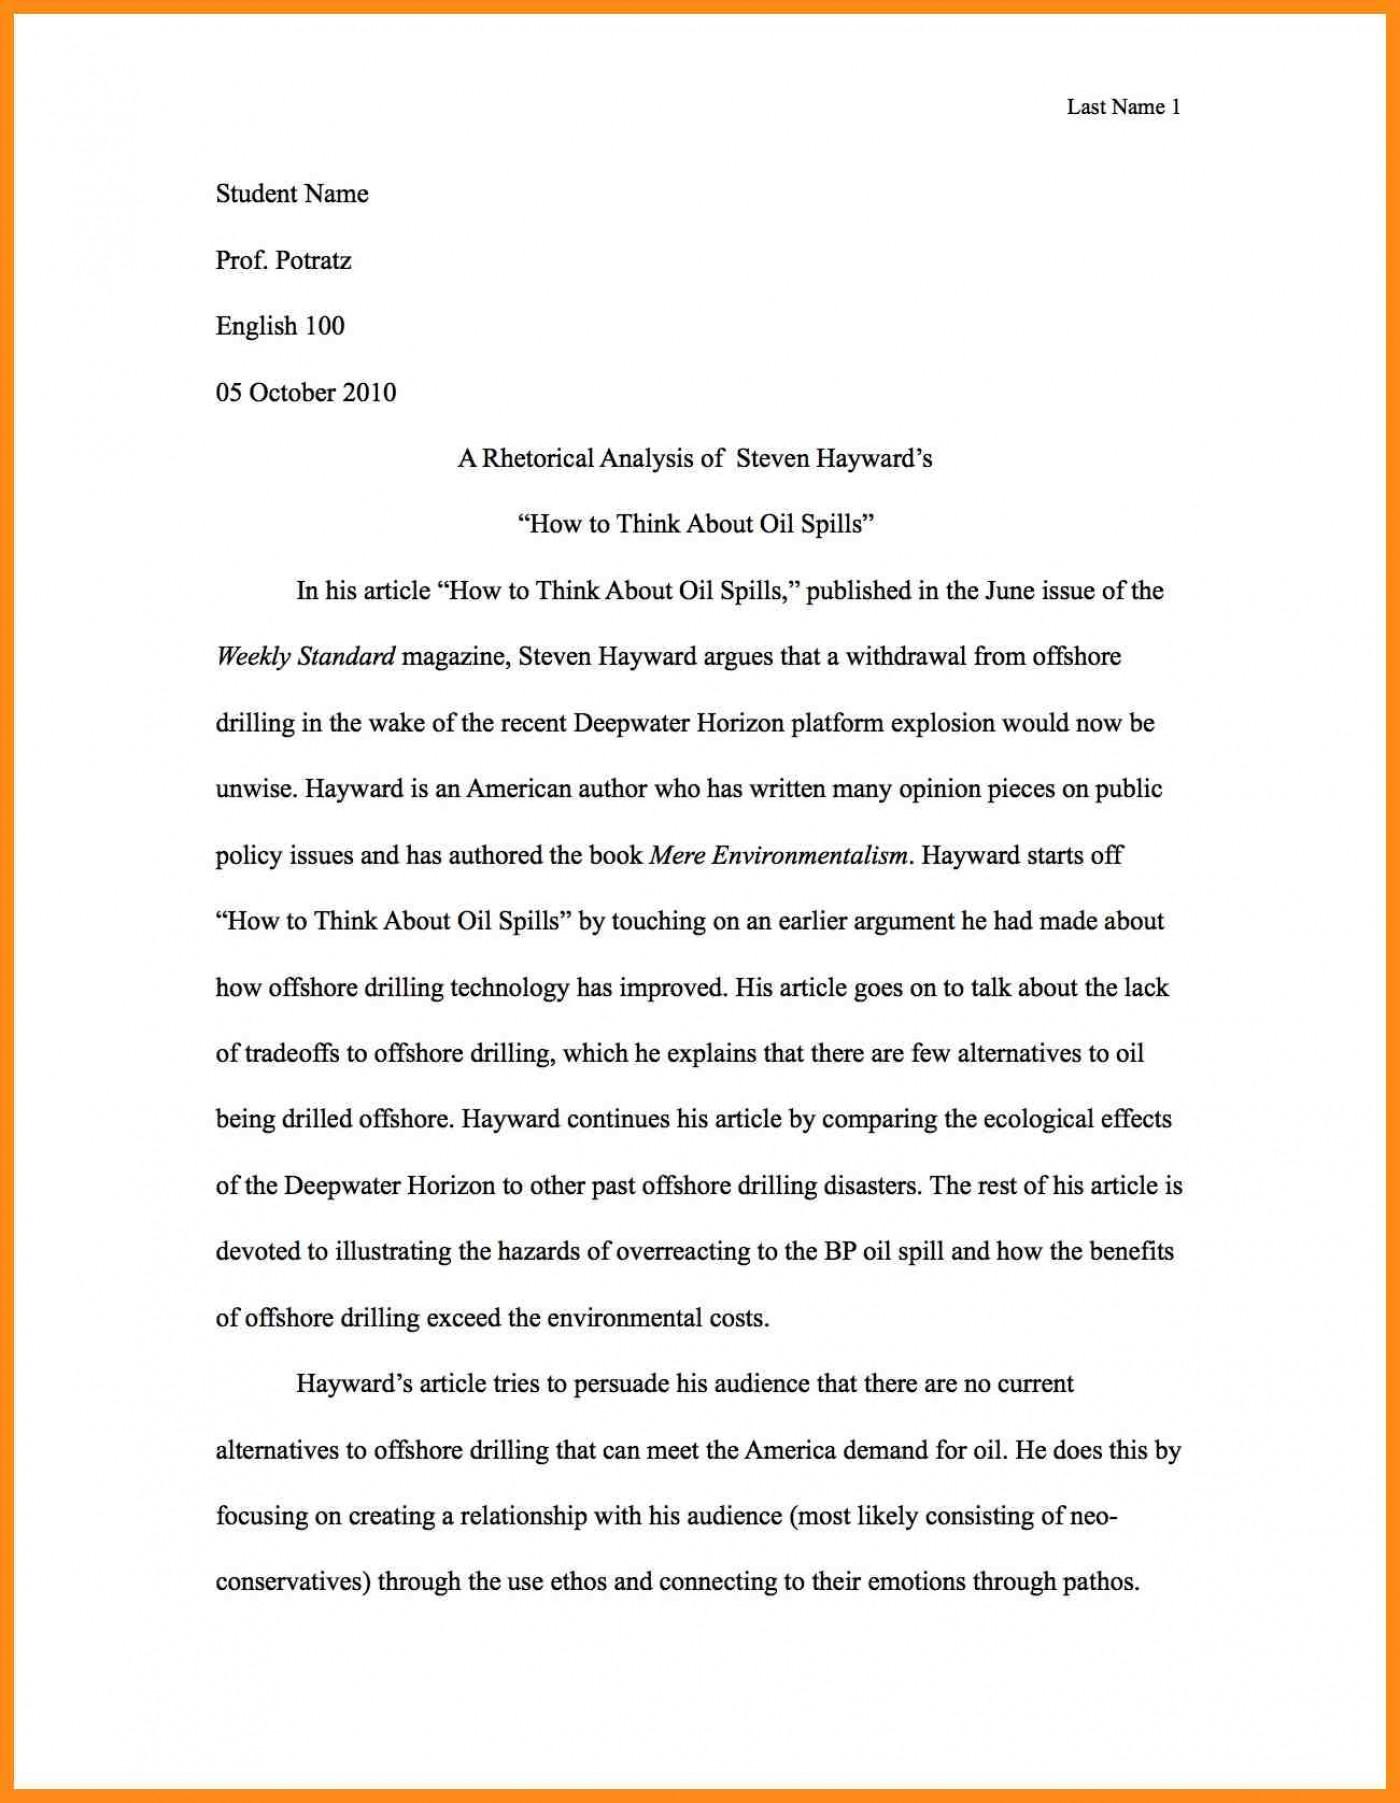 001 Write Best Rhetorical Analysis Essay Example Of Using Ethos Pathos And Logos Pdf Unusual Examples Ap Lang Mode 1400